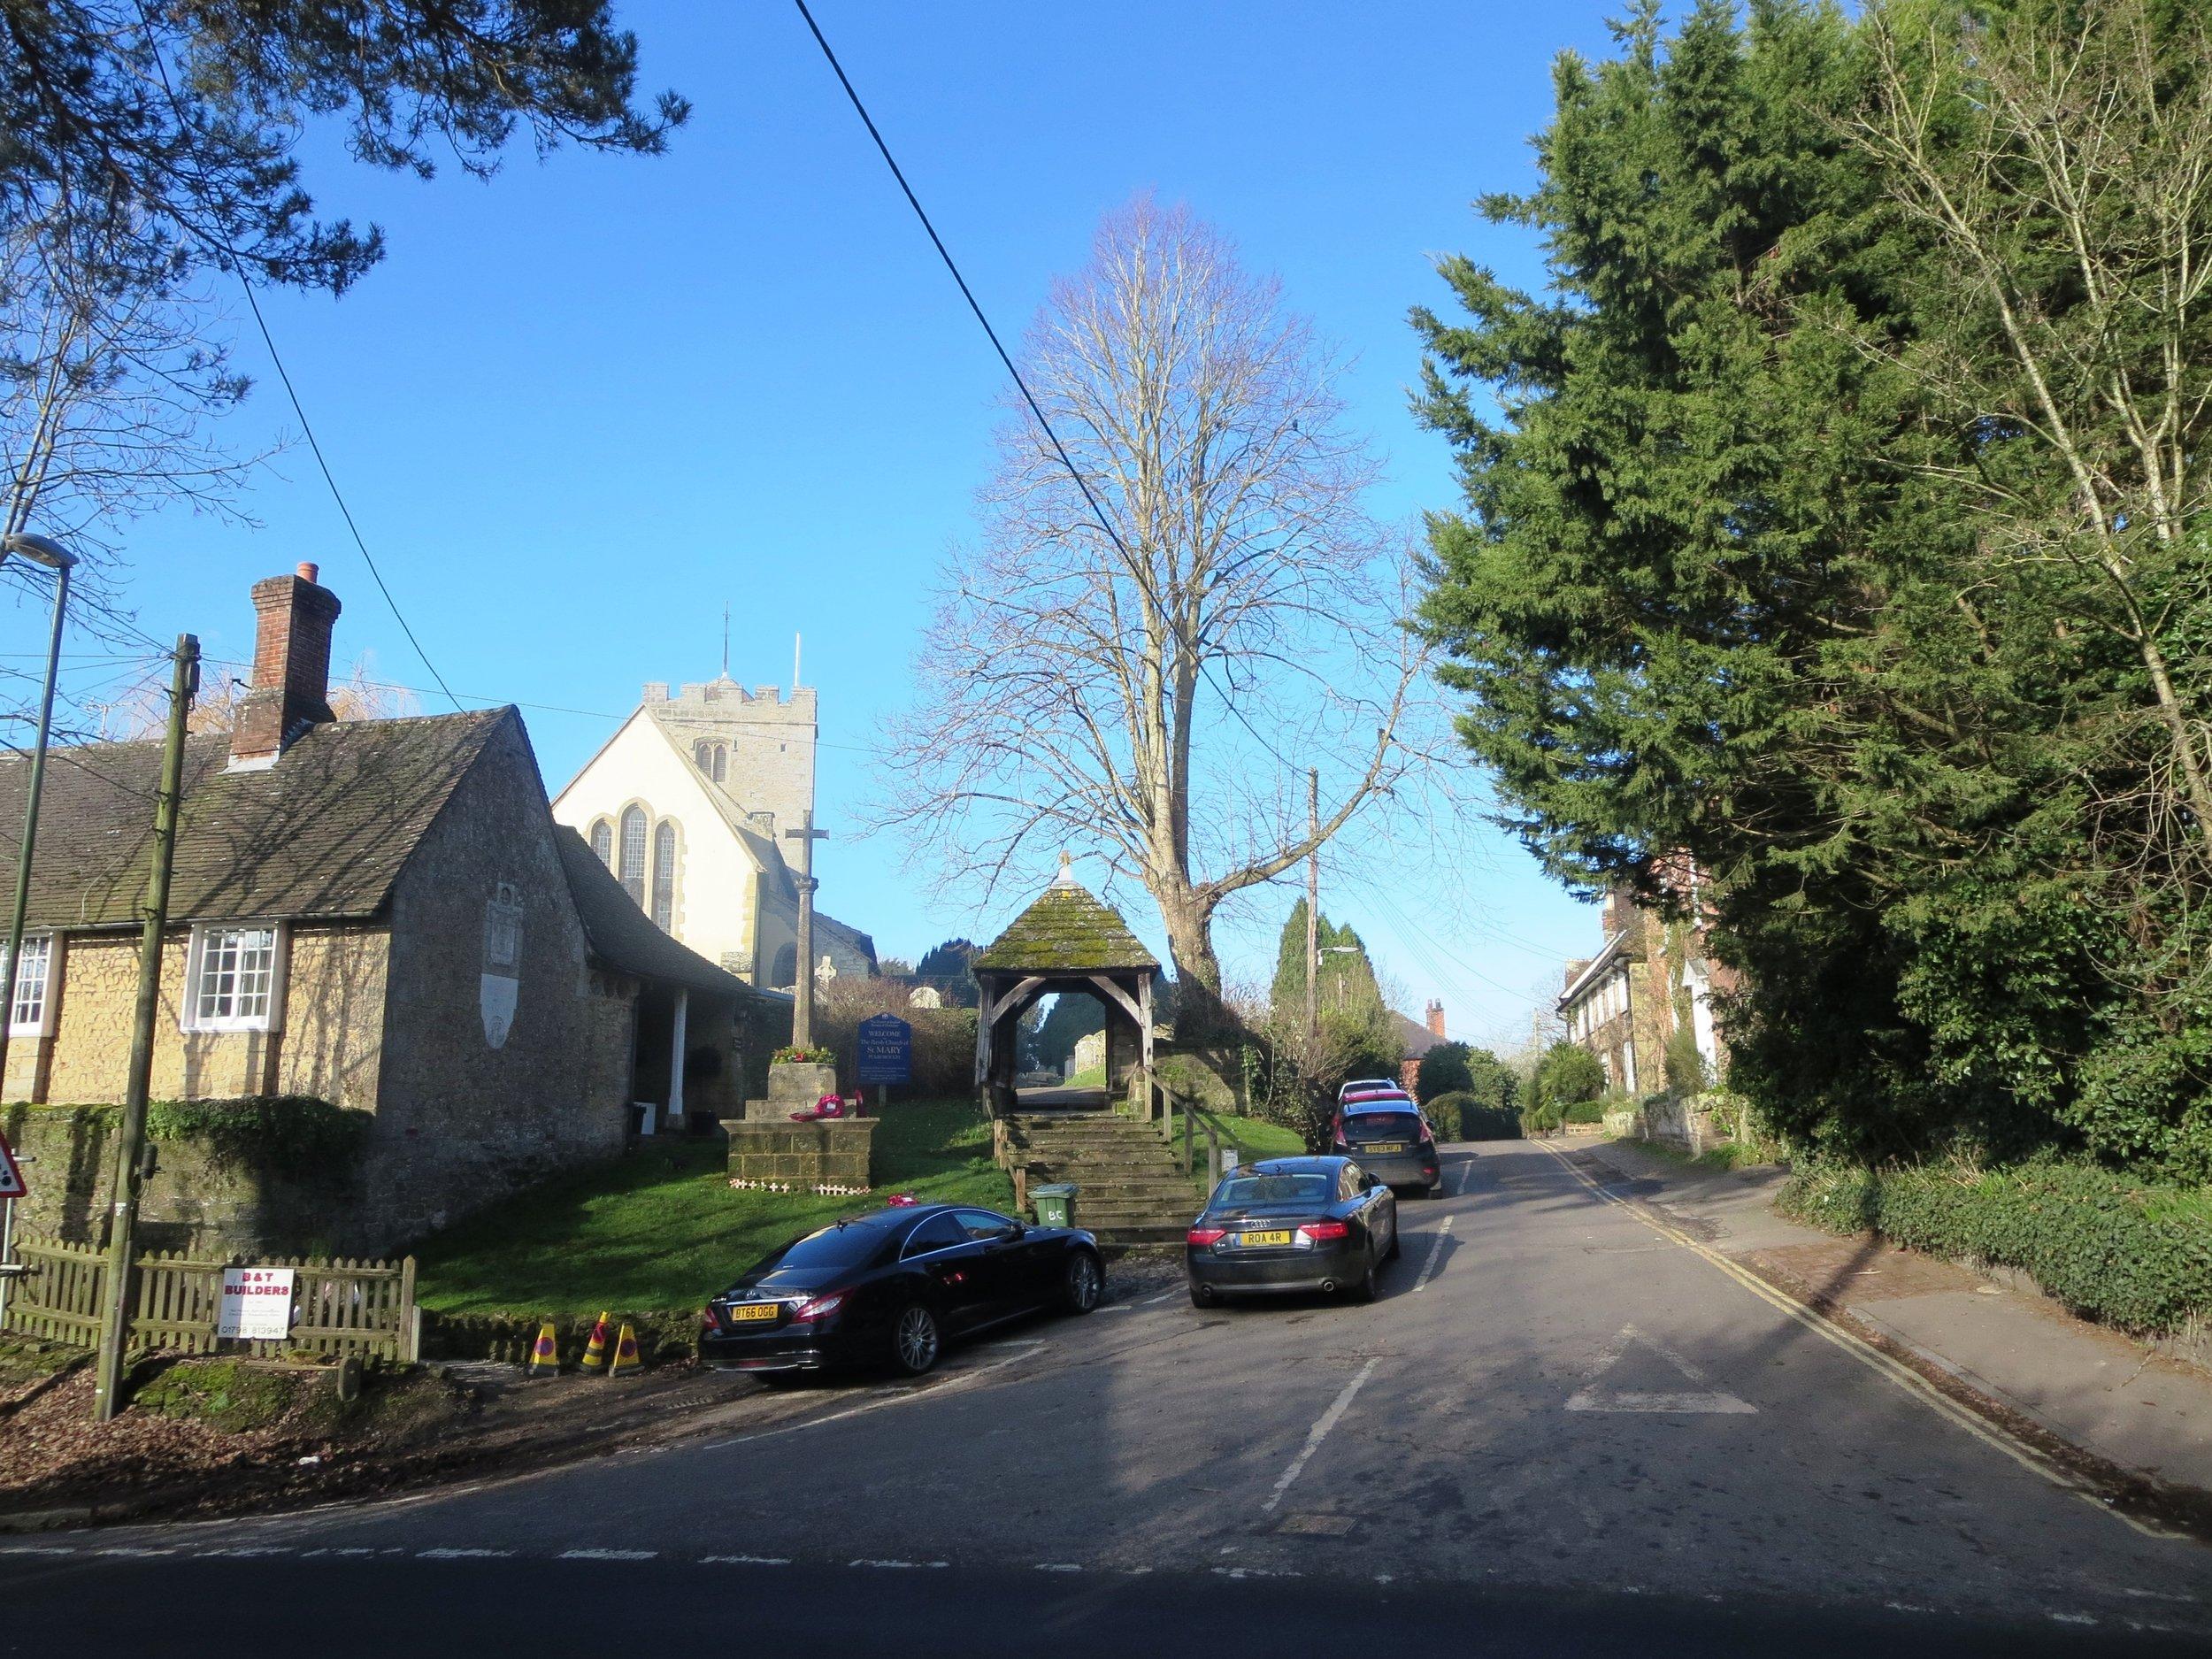 2018 - Feb - Houses in Church Place Pulborough.jpg